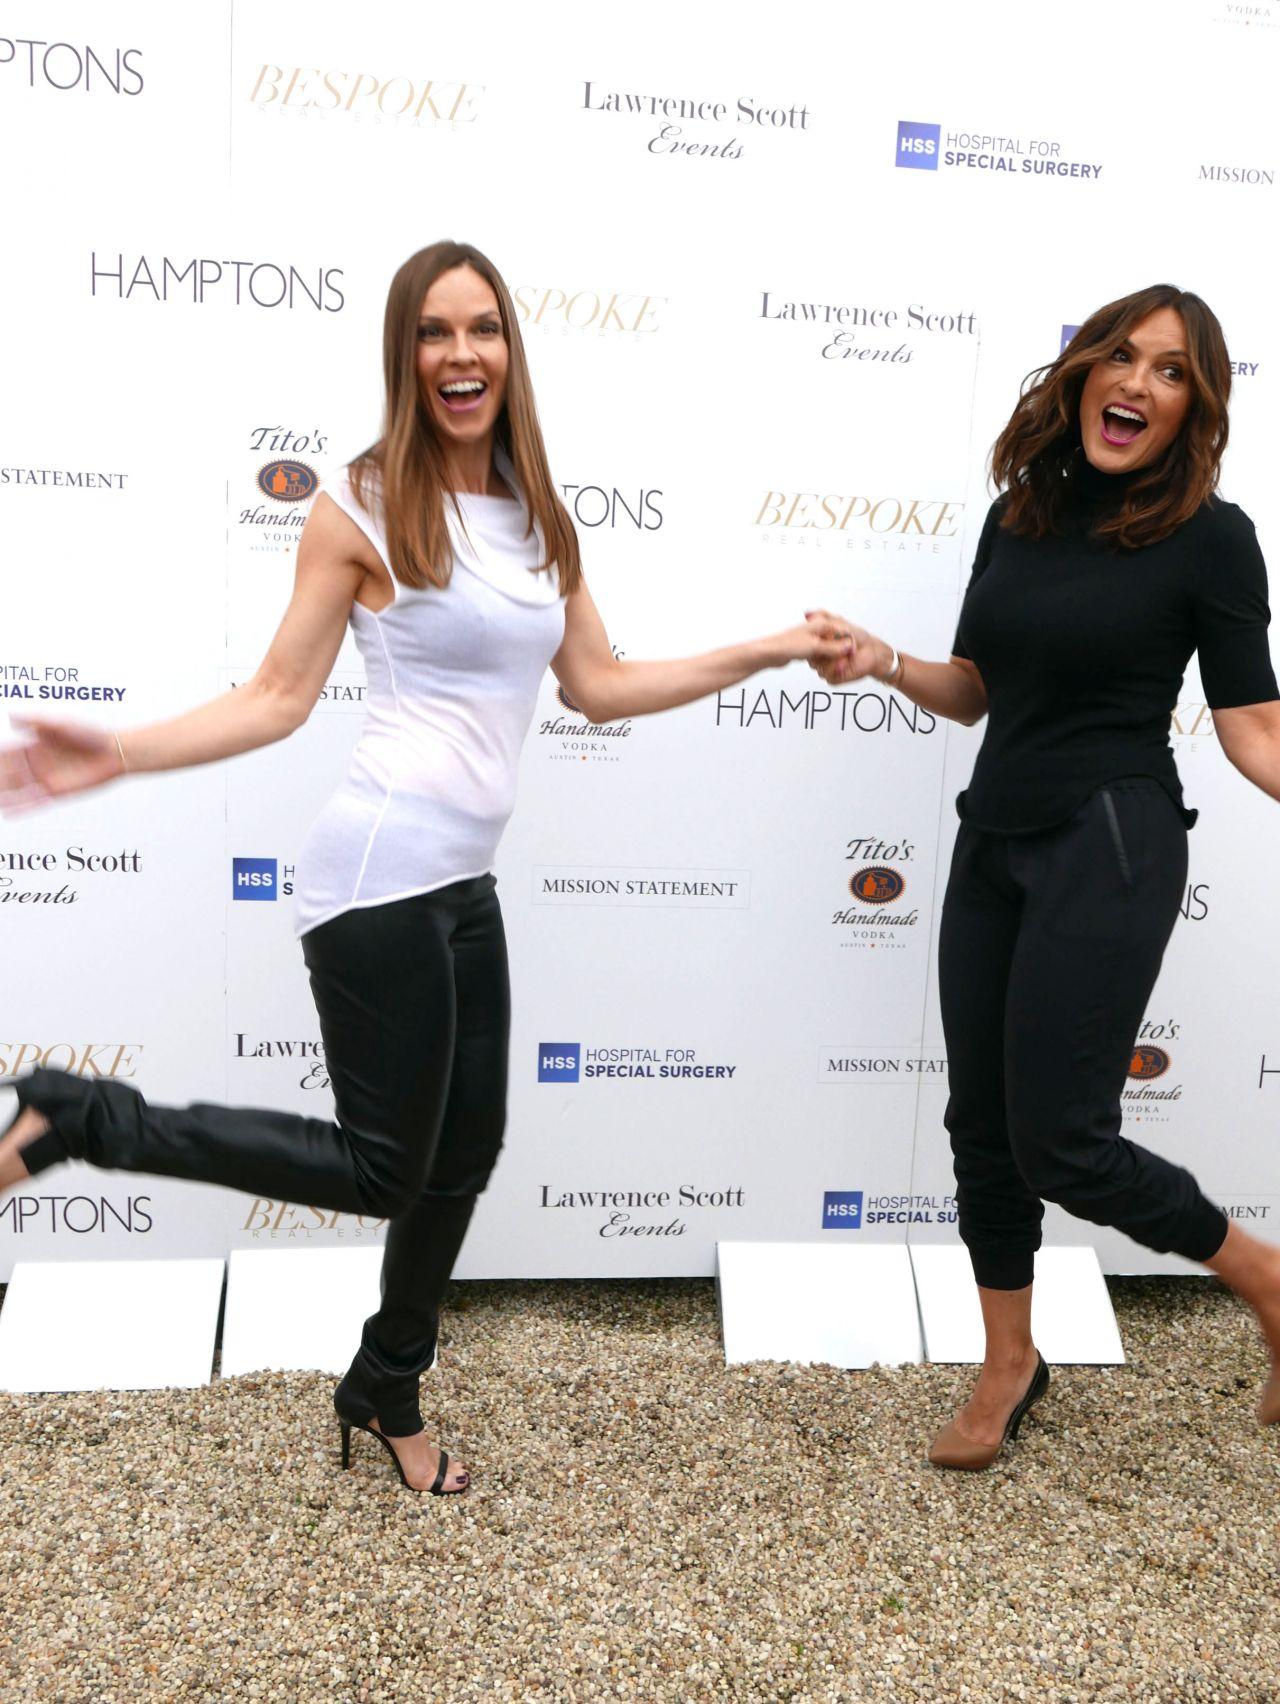 Hilary Swank Amp Mariska Hargitay Hamptons Magazine